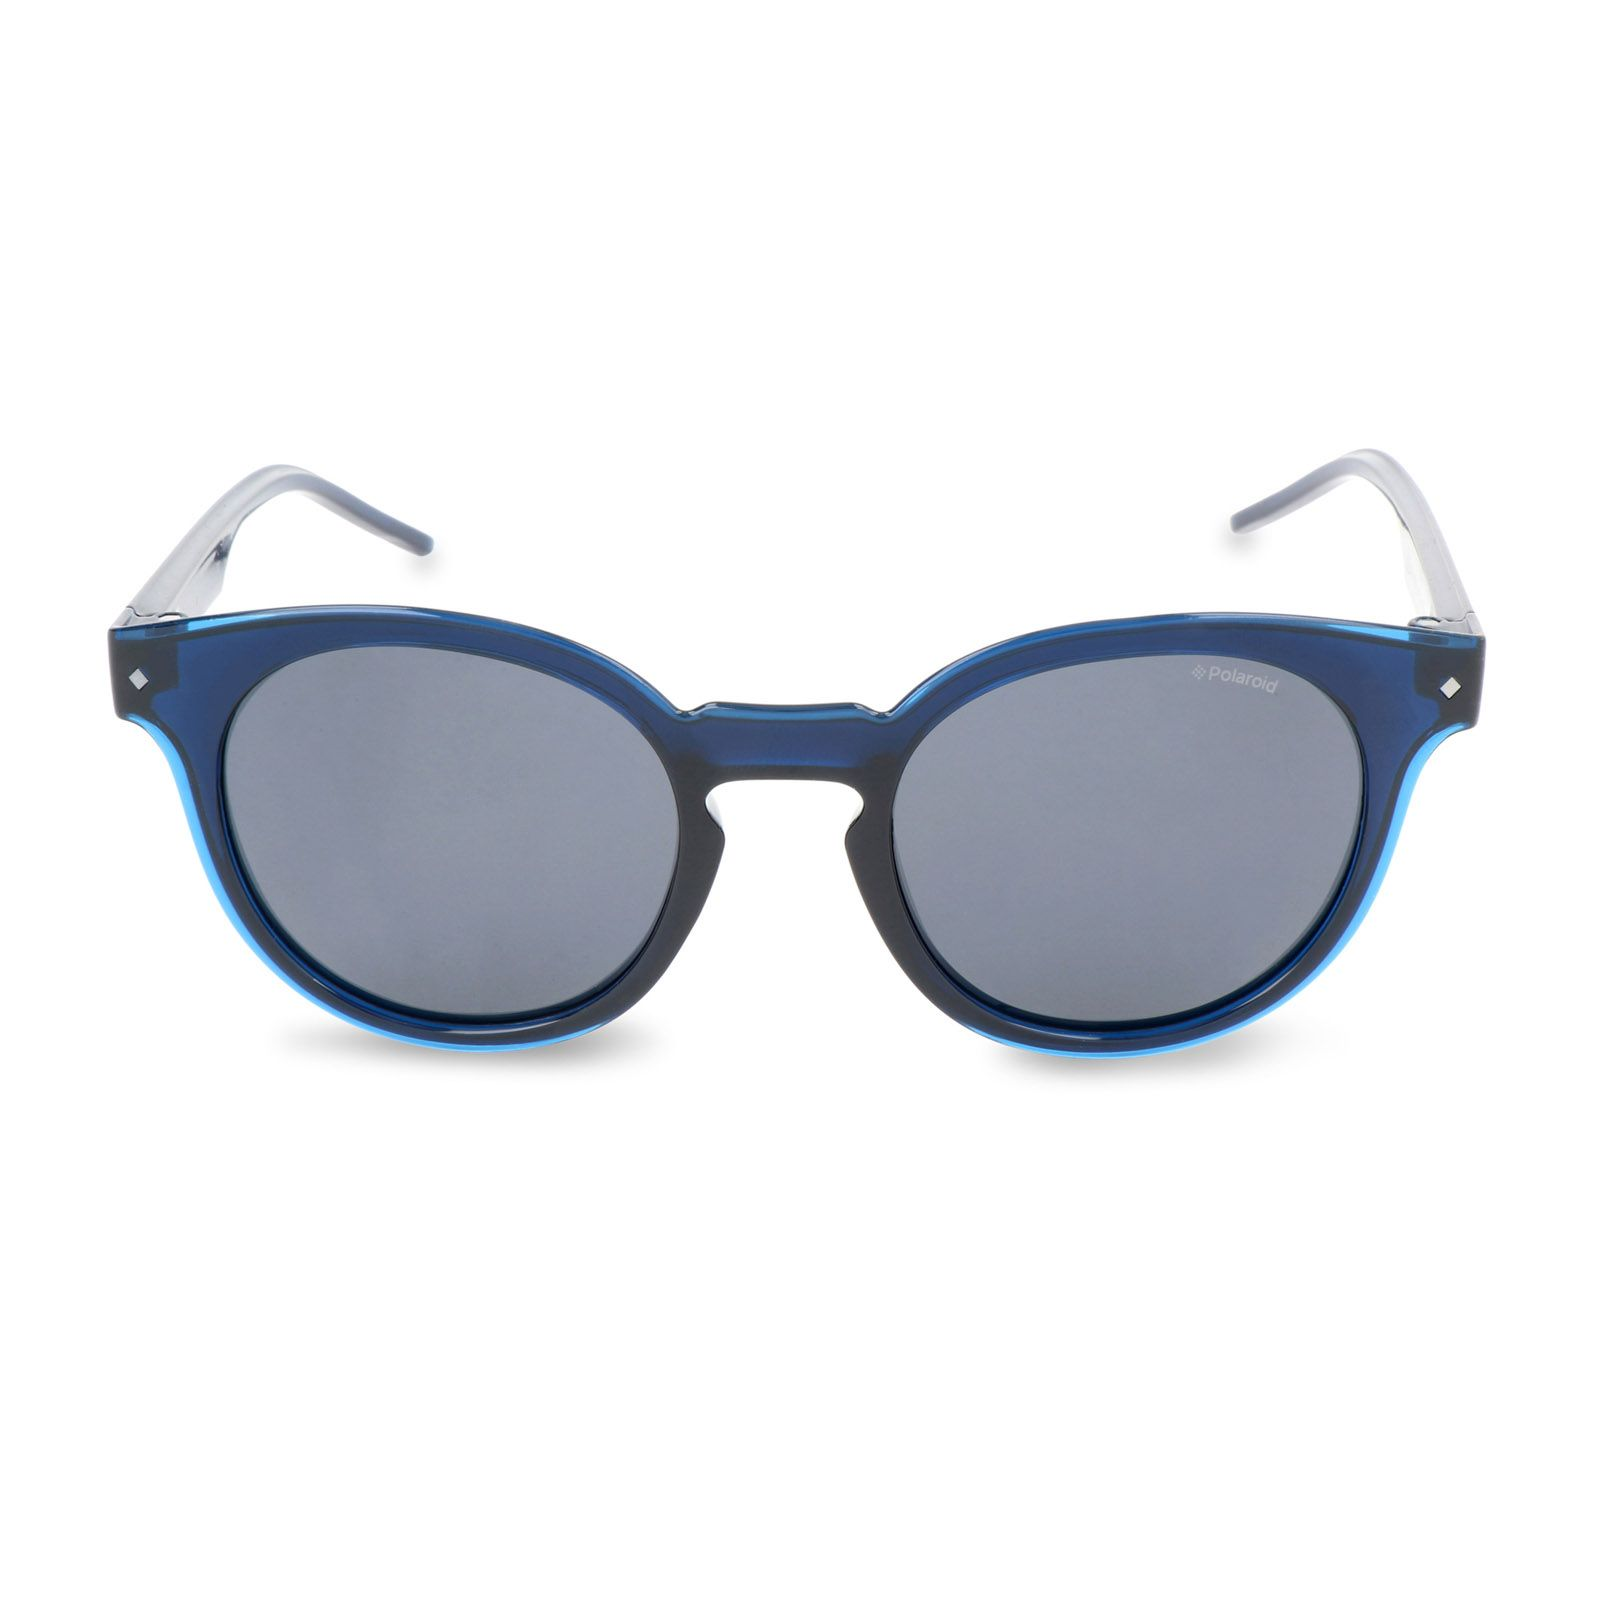 Polaroid Unisexs Sunglasses